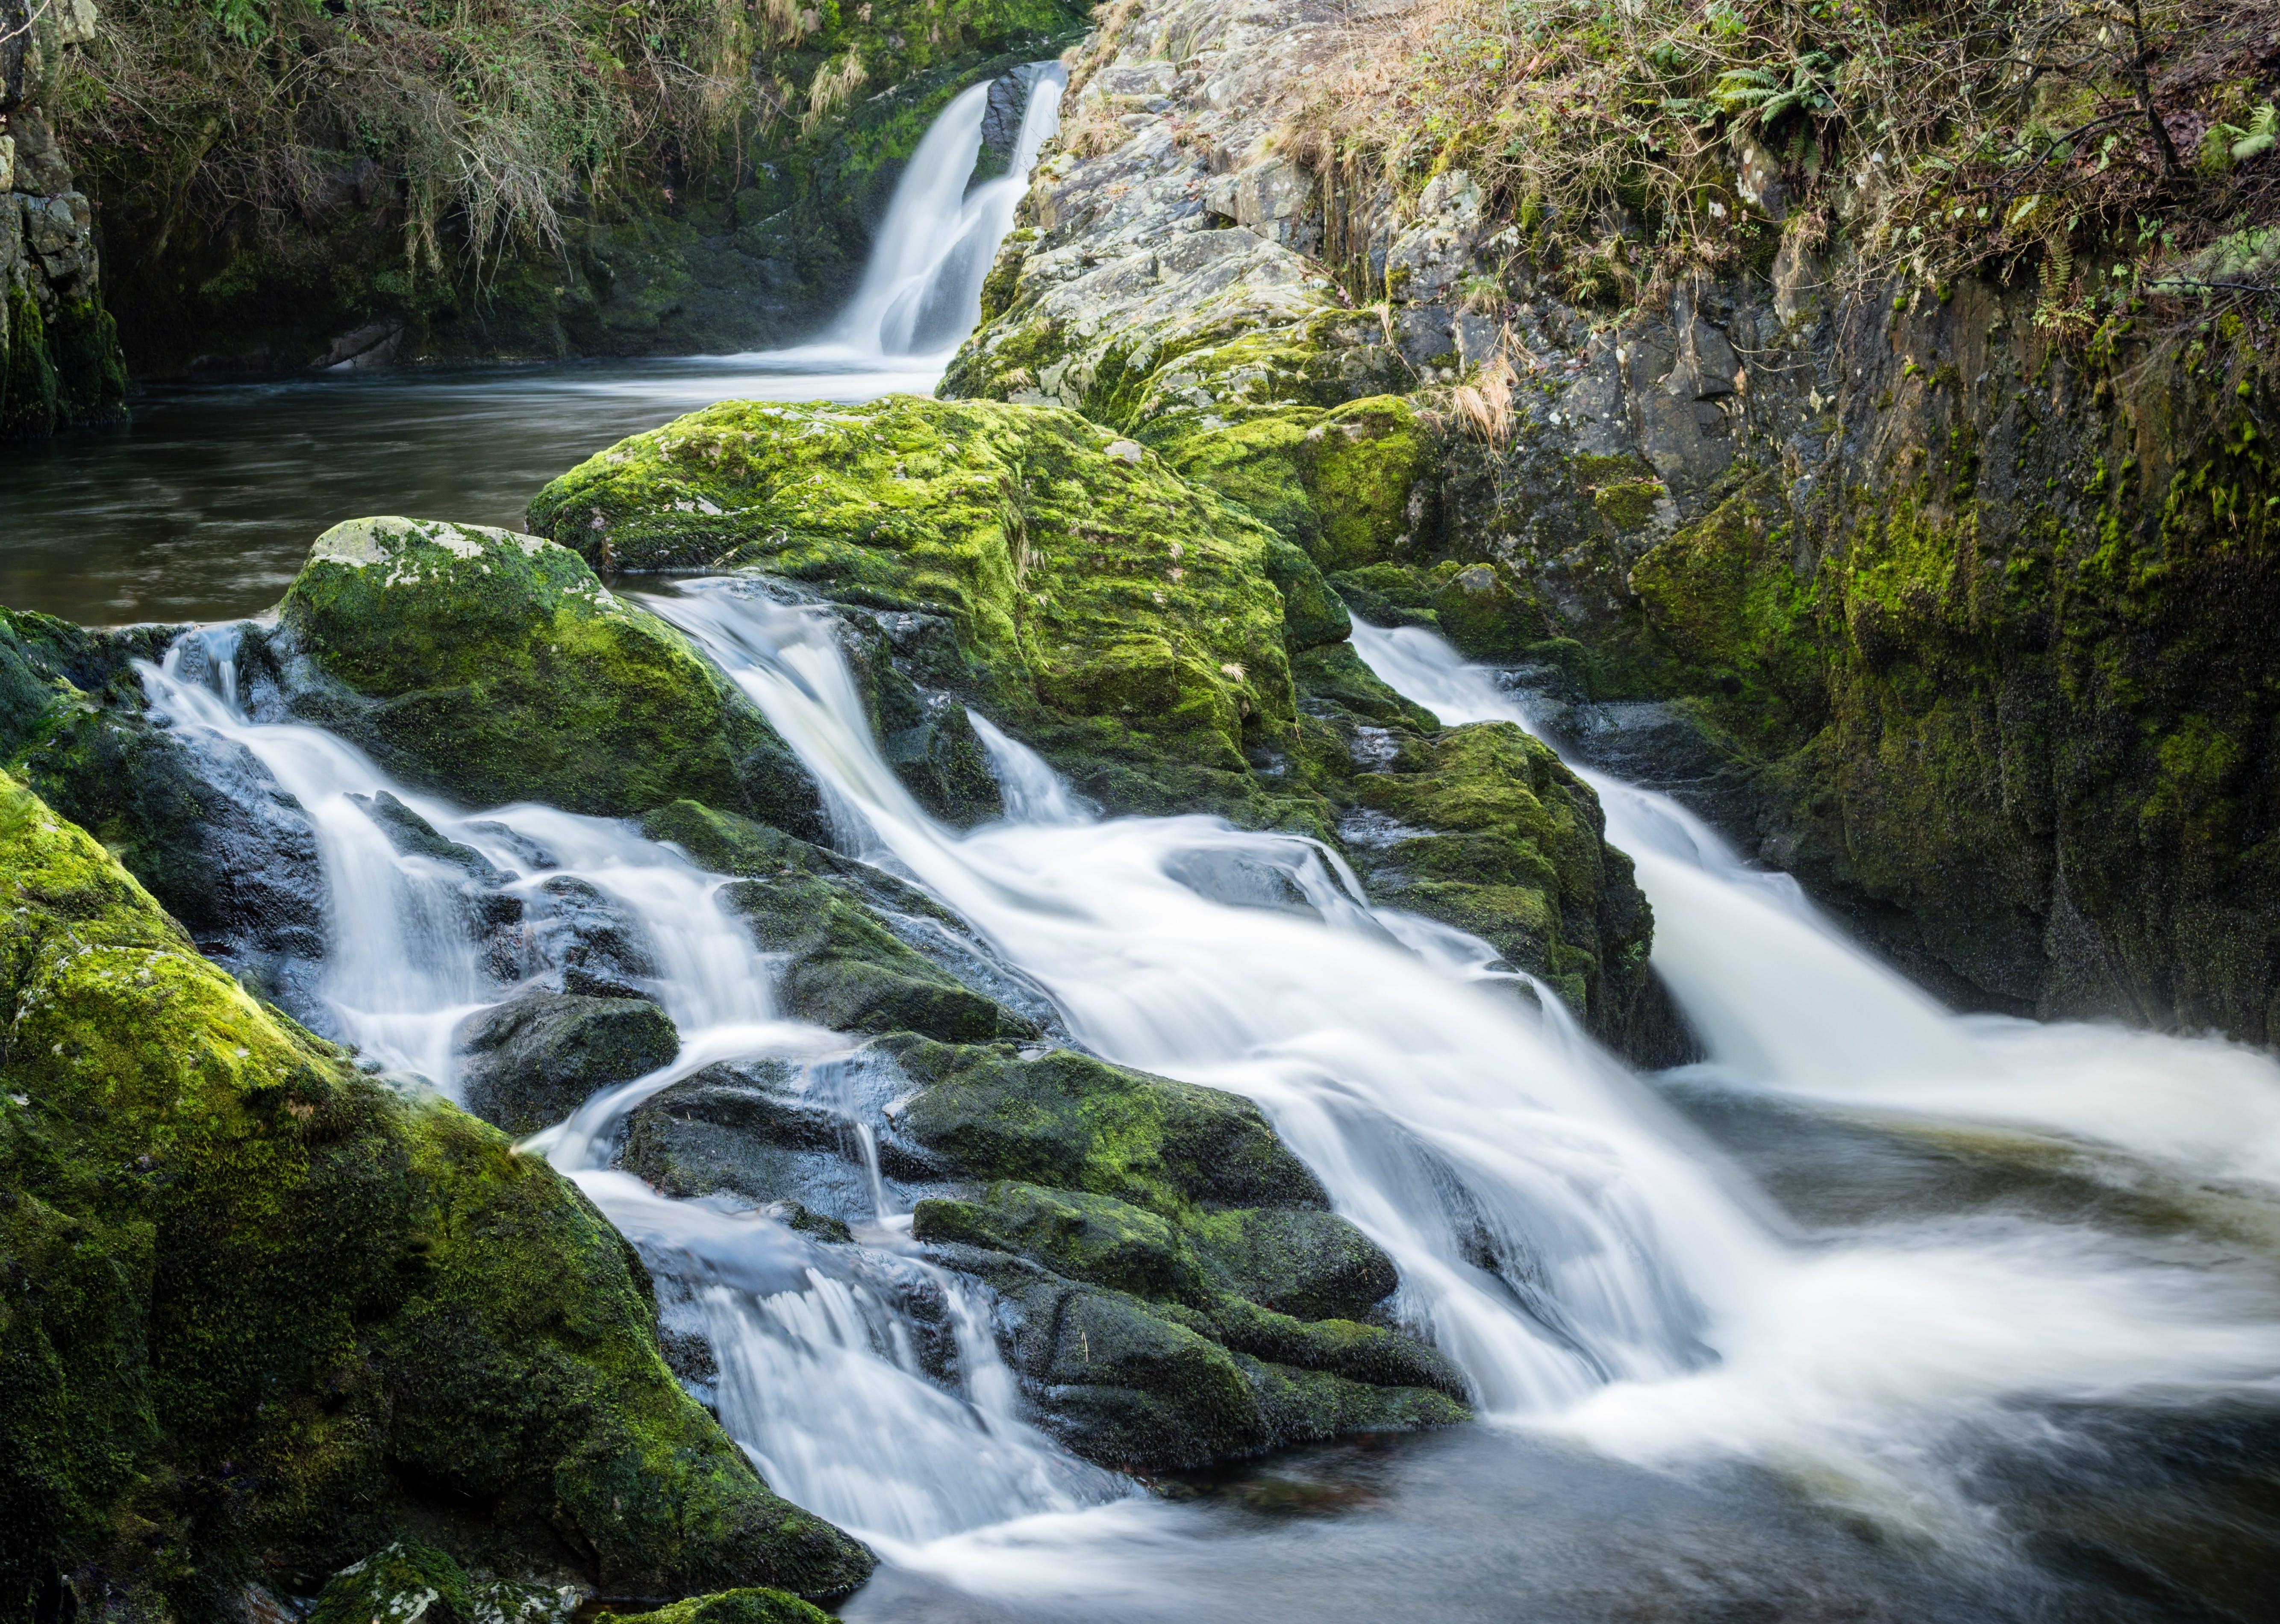 cascade, environment, flowing